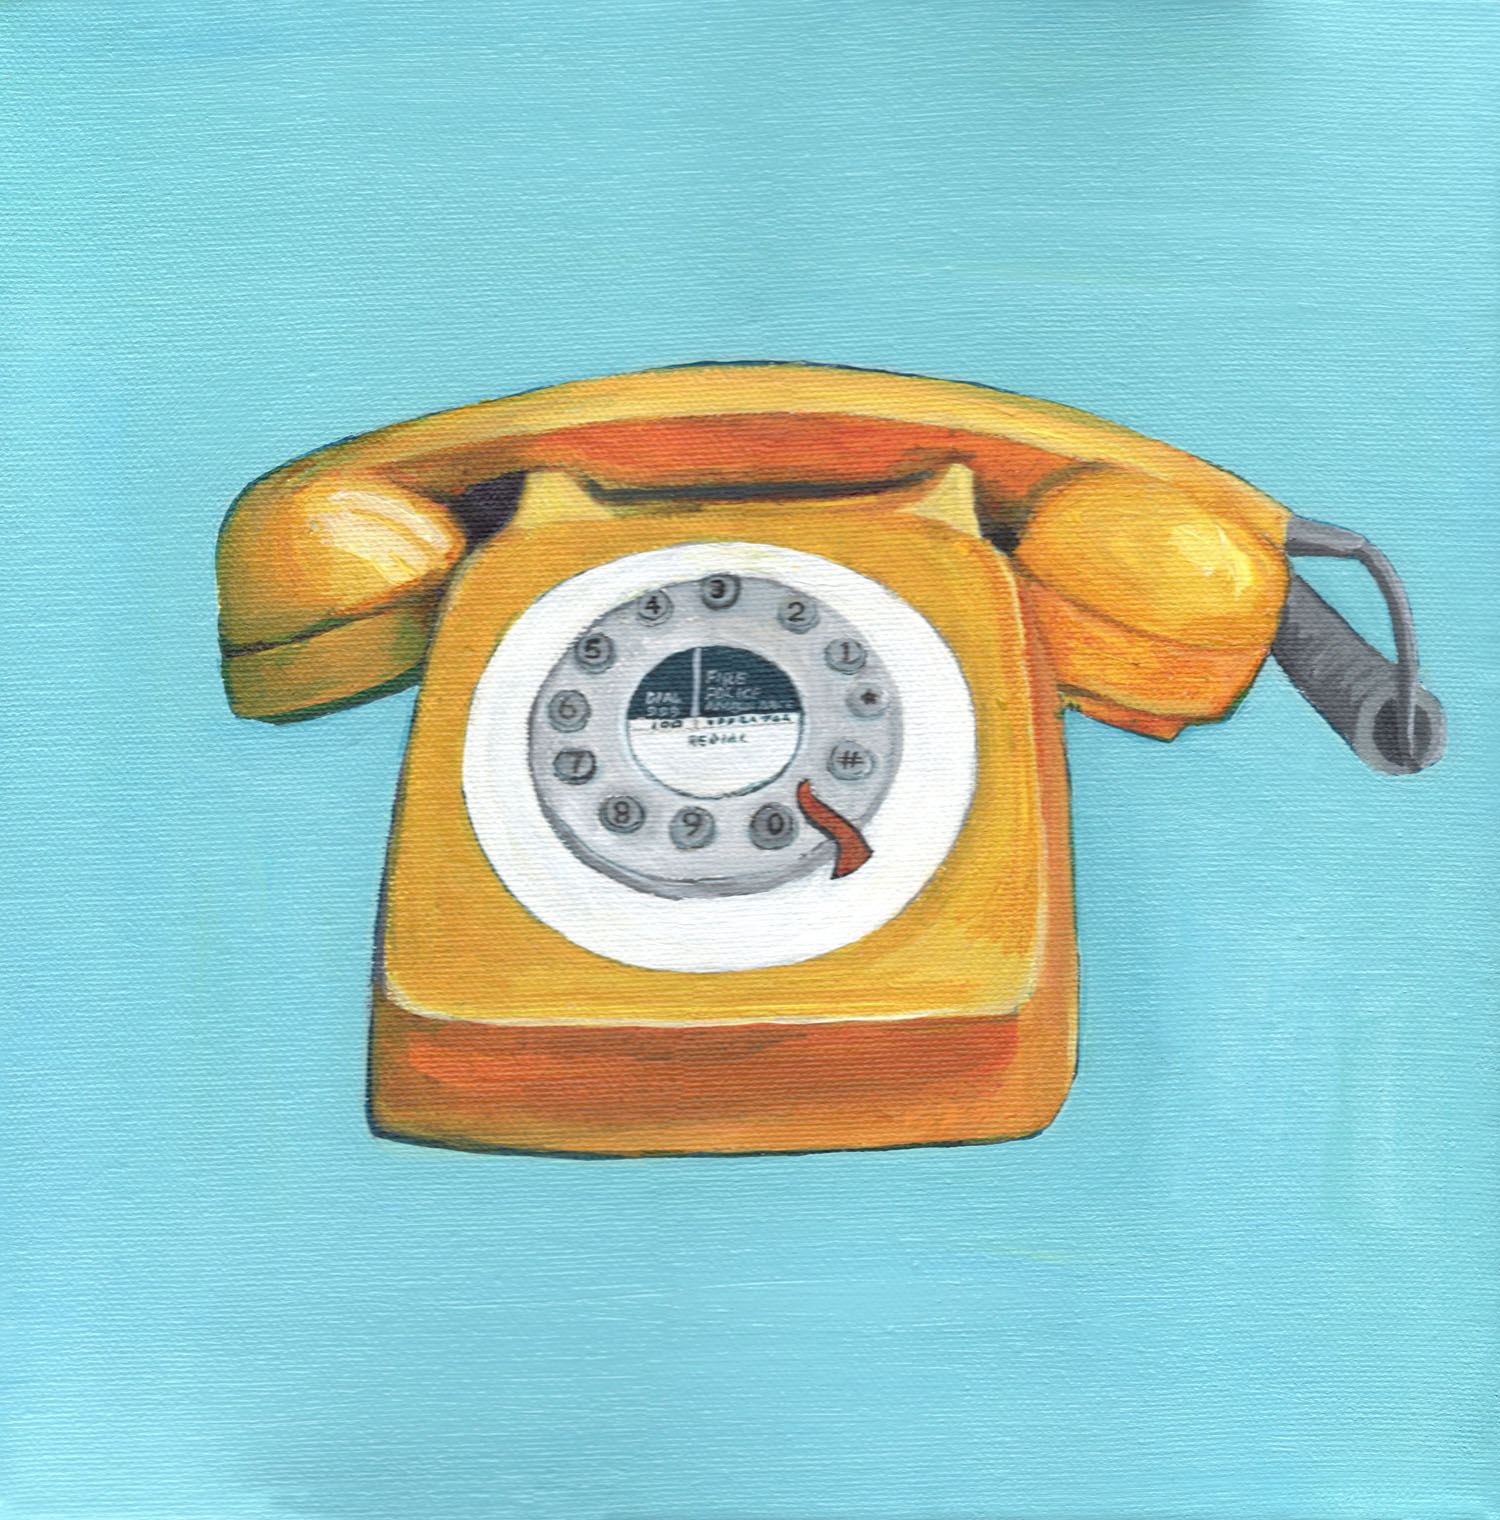 Yellow Telephone - Retro Pop Illustration Painting of Vintage Phone -  Eleanore Ditchburn